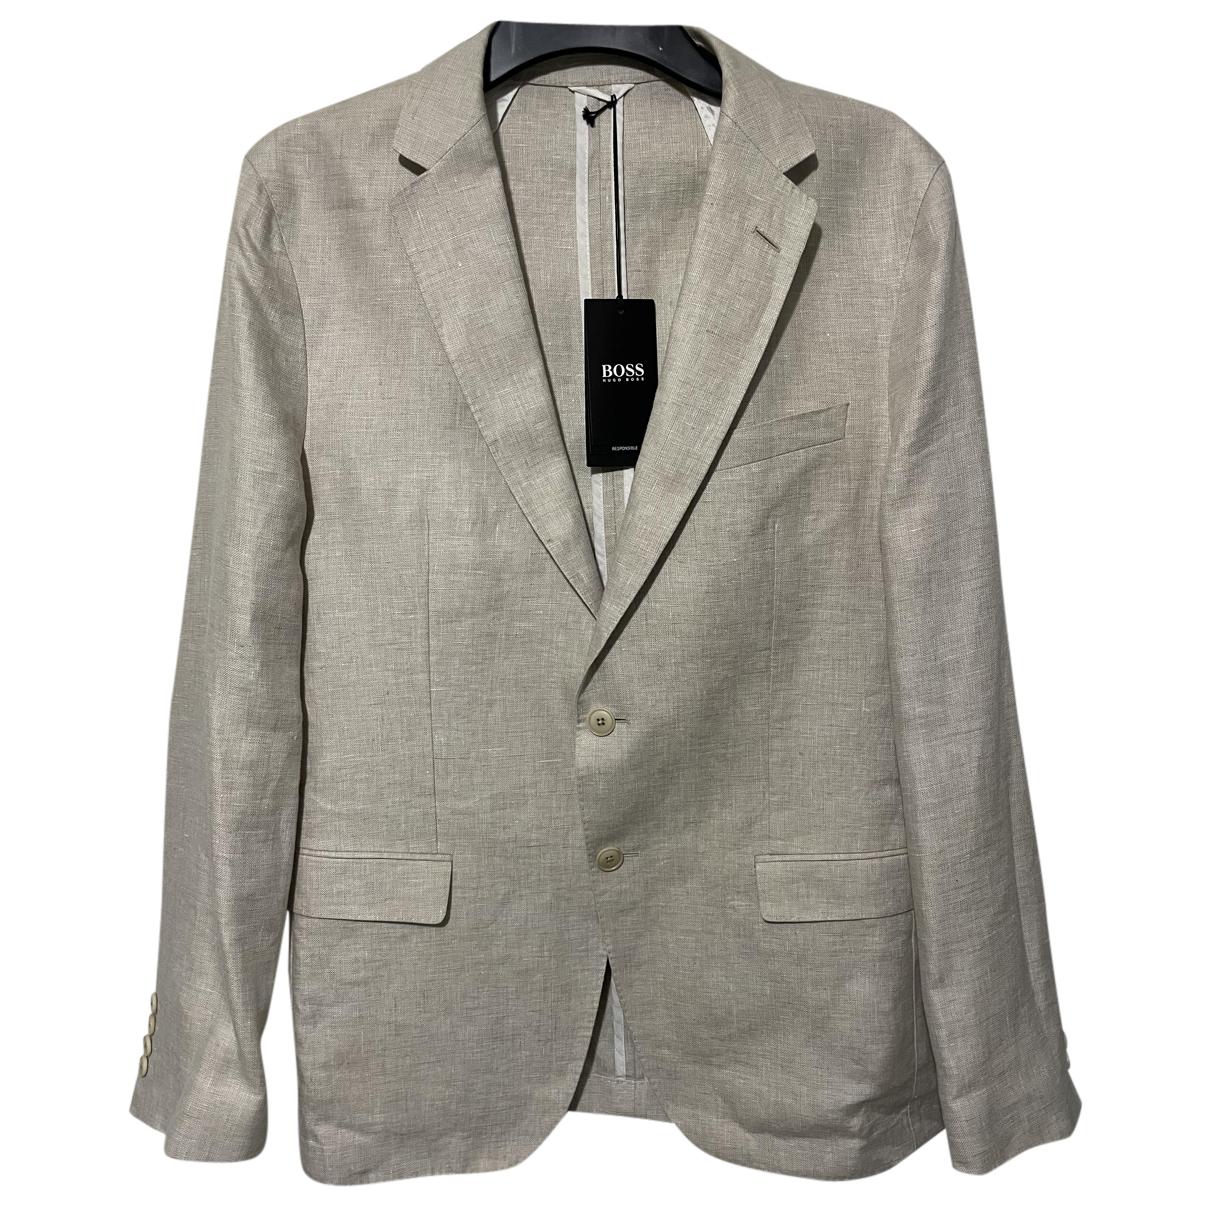 Boss N Beige Linen Suits for Men 52 IT